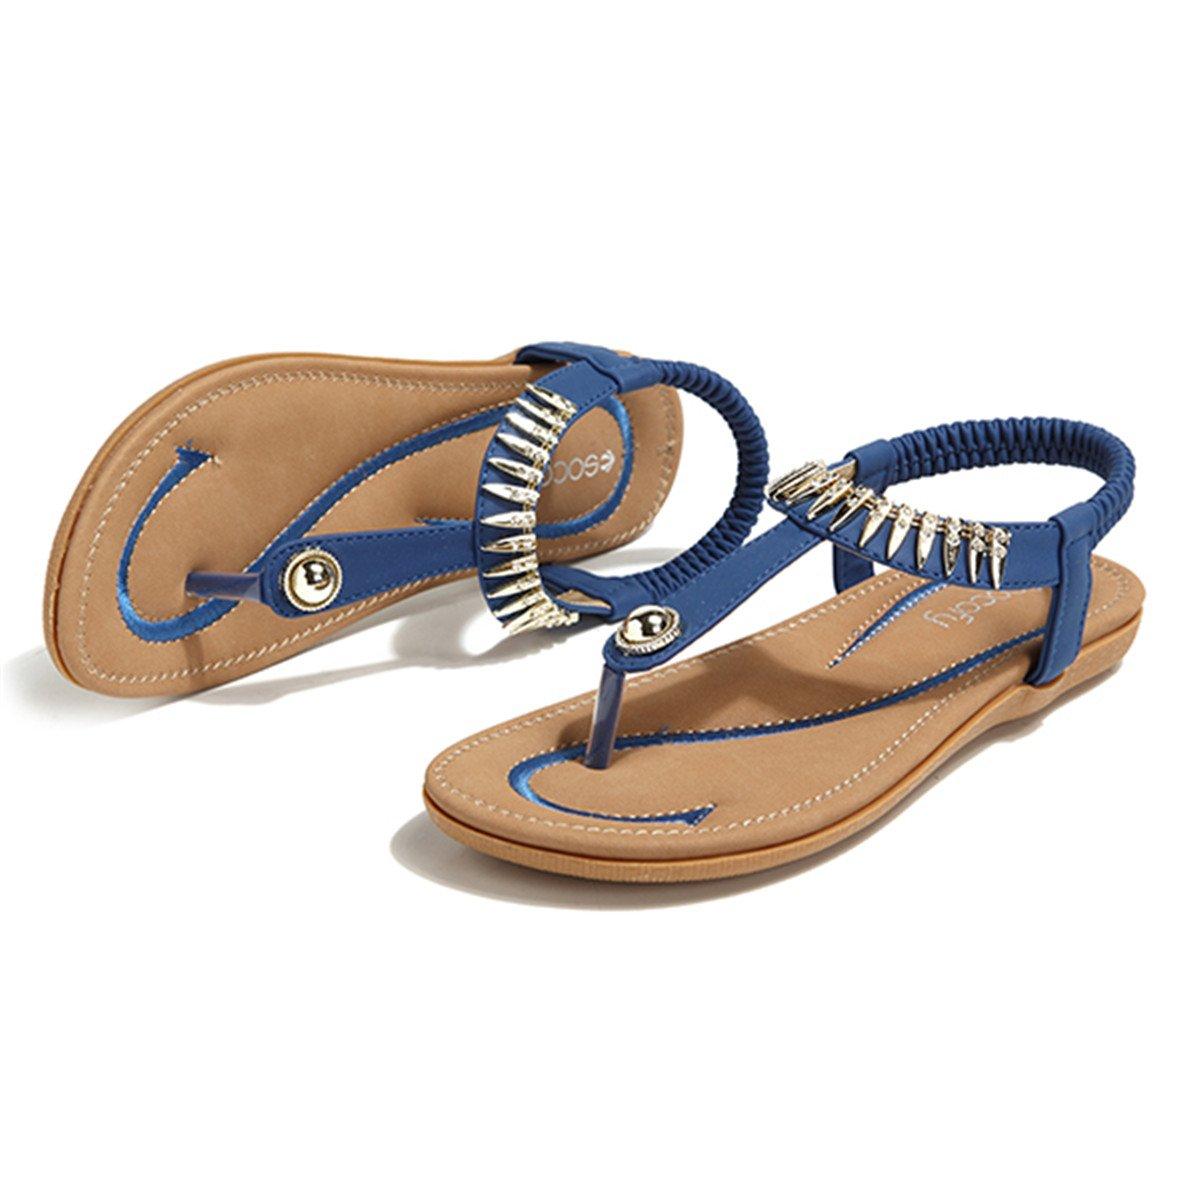 Socofy Bohemian Sandals,Women's Metal Elastic Flat Sandals Summer Bohemia Style Clip Toe Flip Flops Shoes Blue 9 B(M) US by Socofy (Image #6)